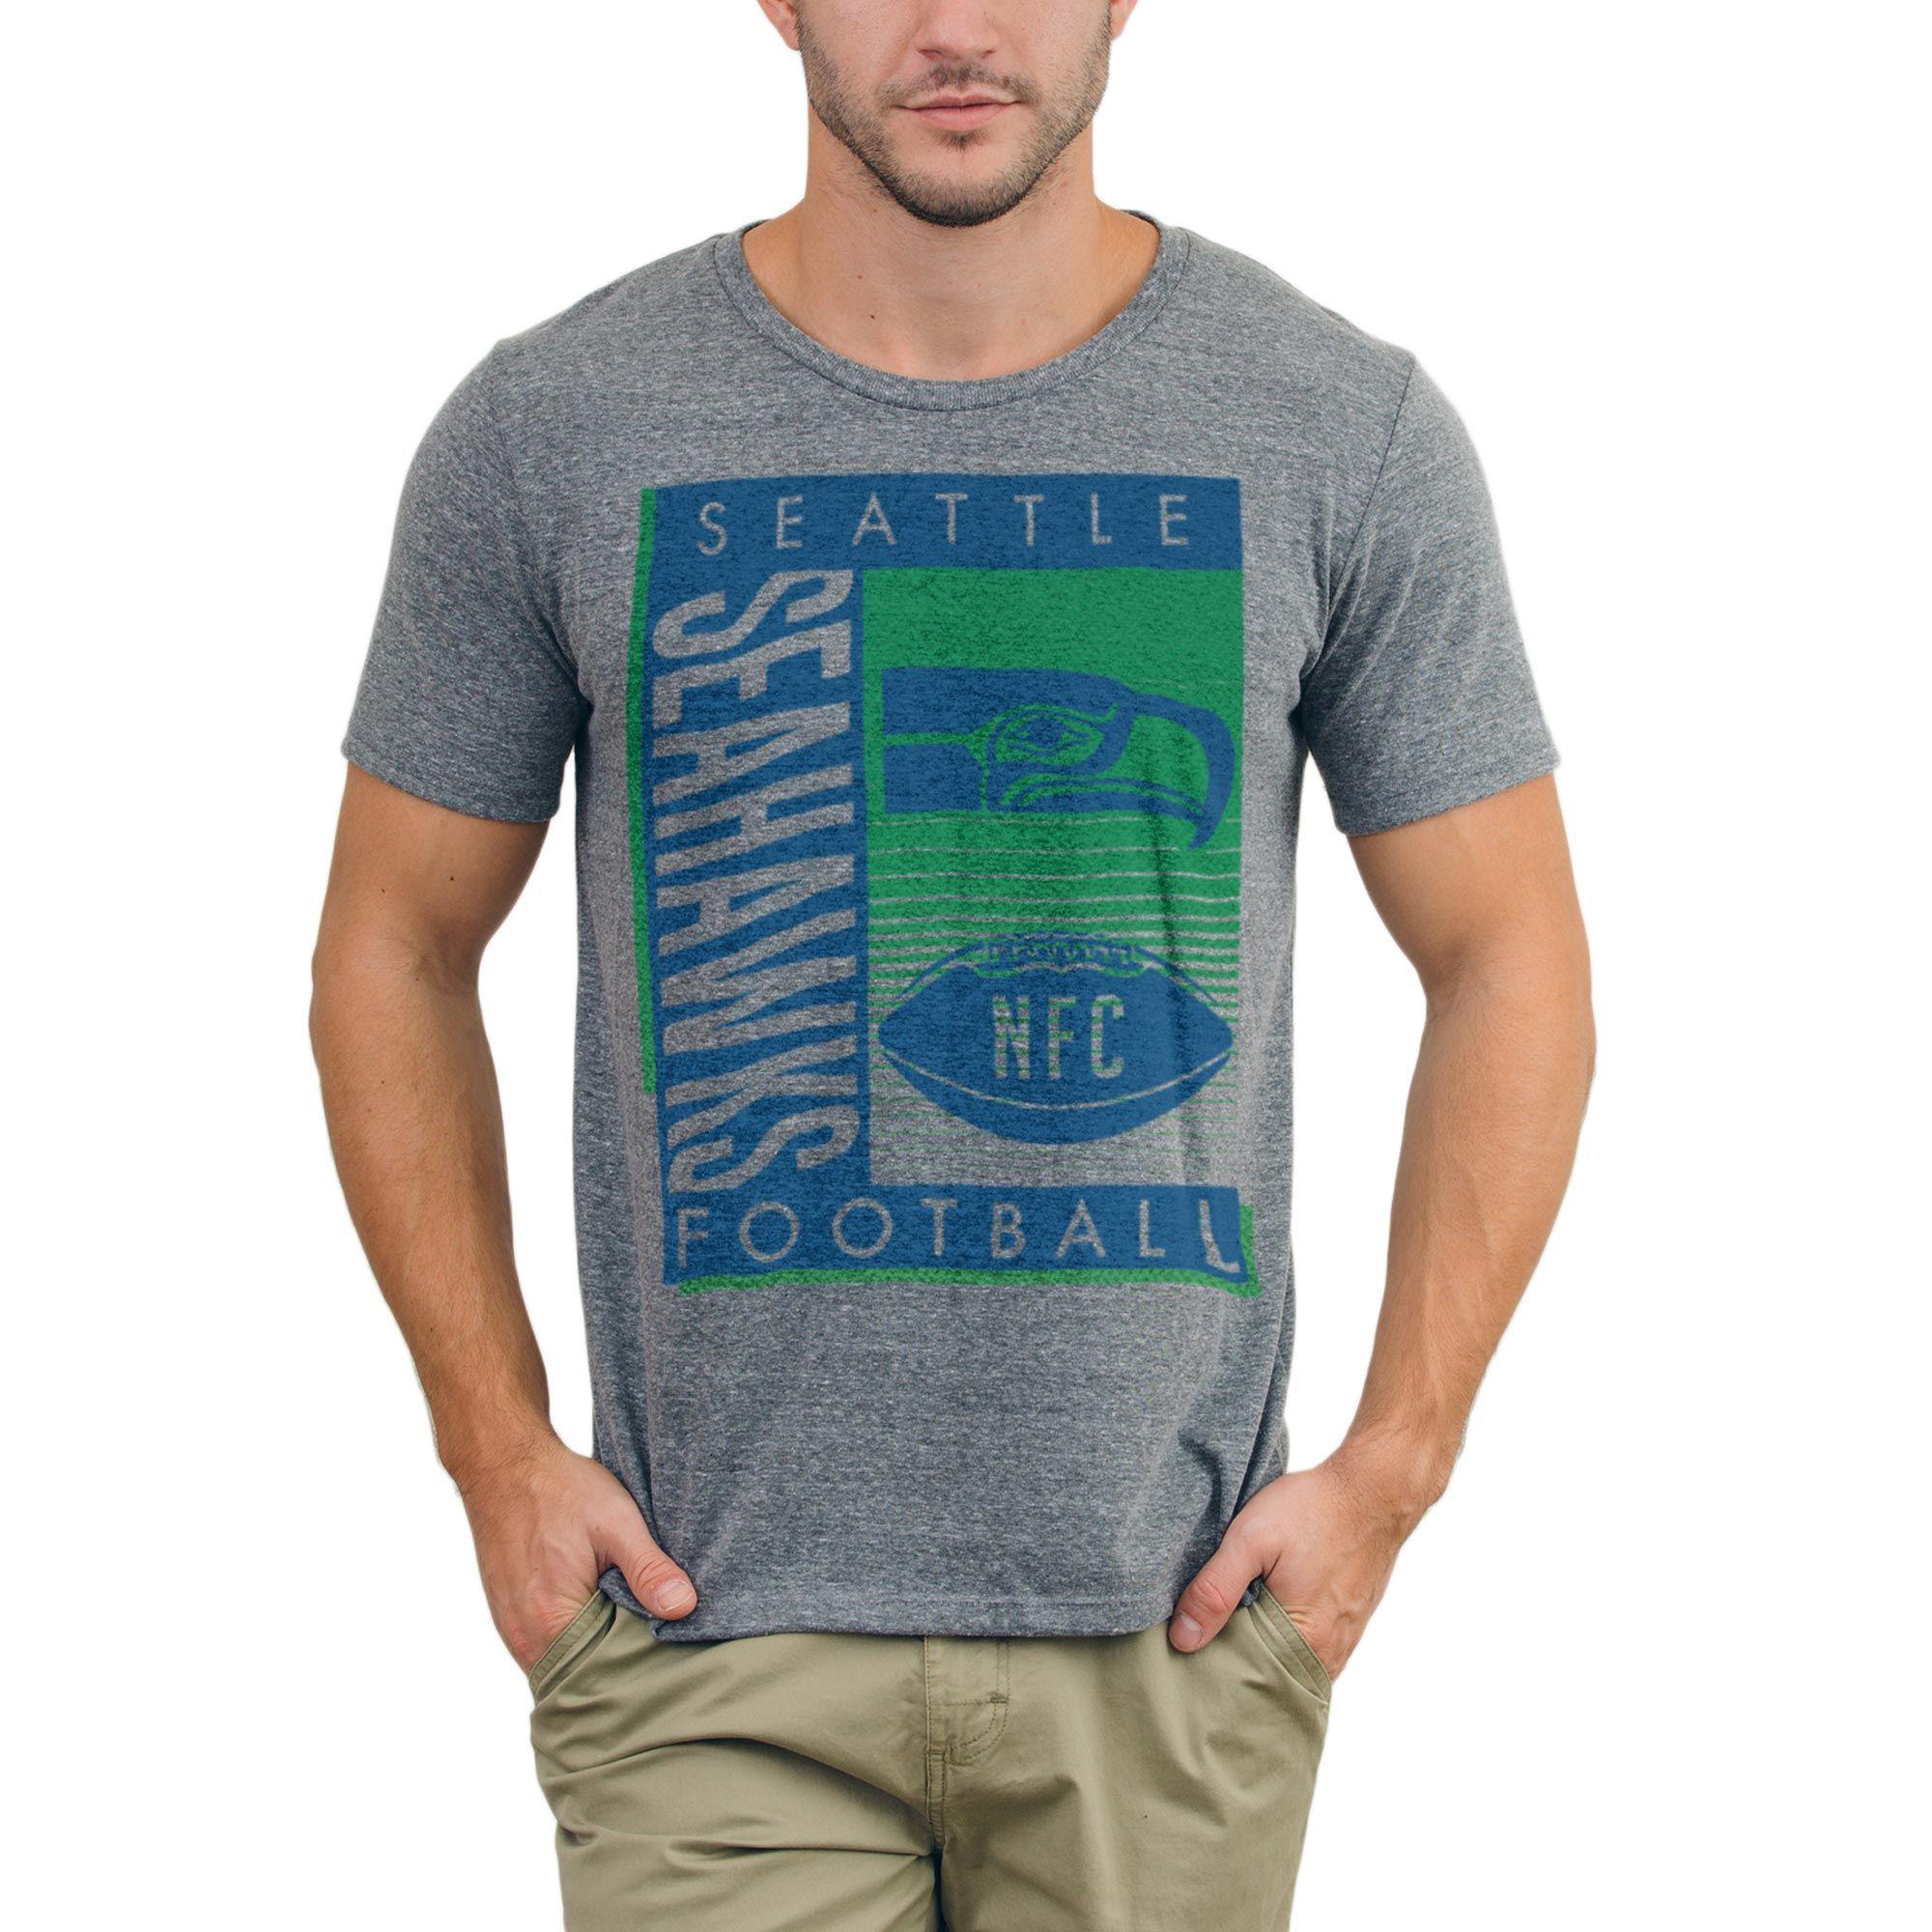 NFL Seattle Seahawks Junk Food Touchdown TriBlend TShirt